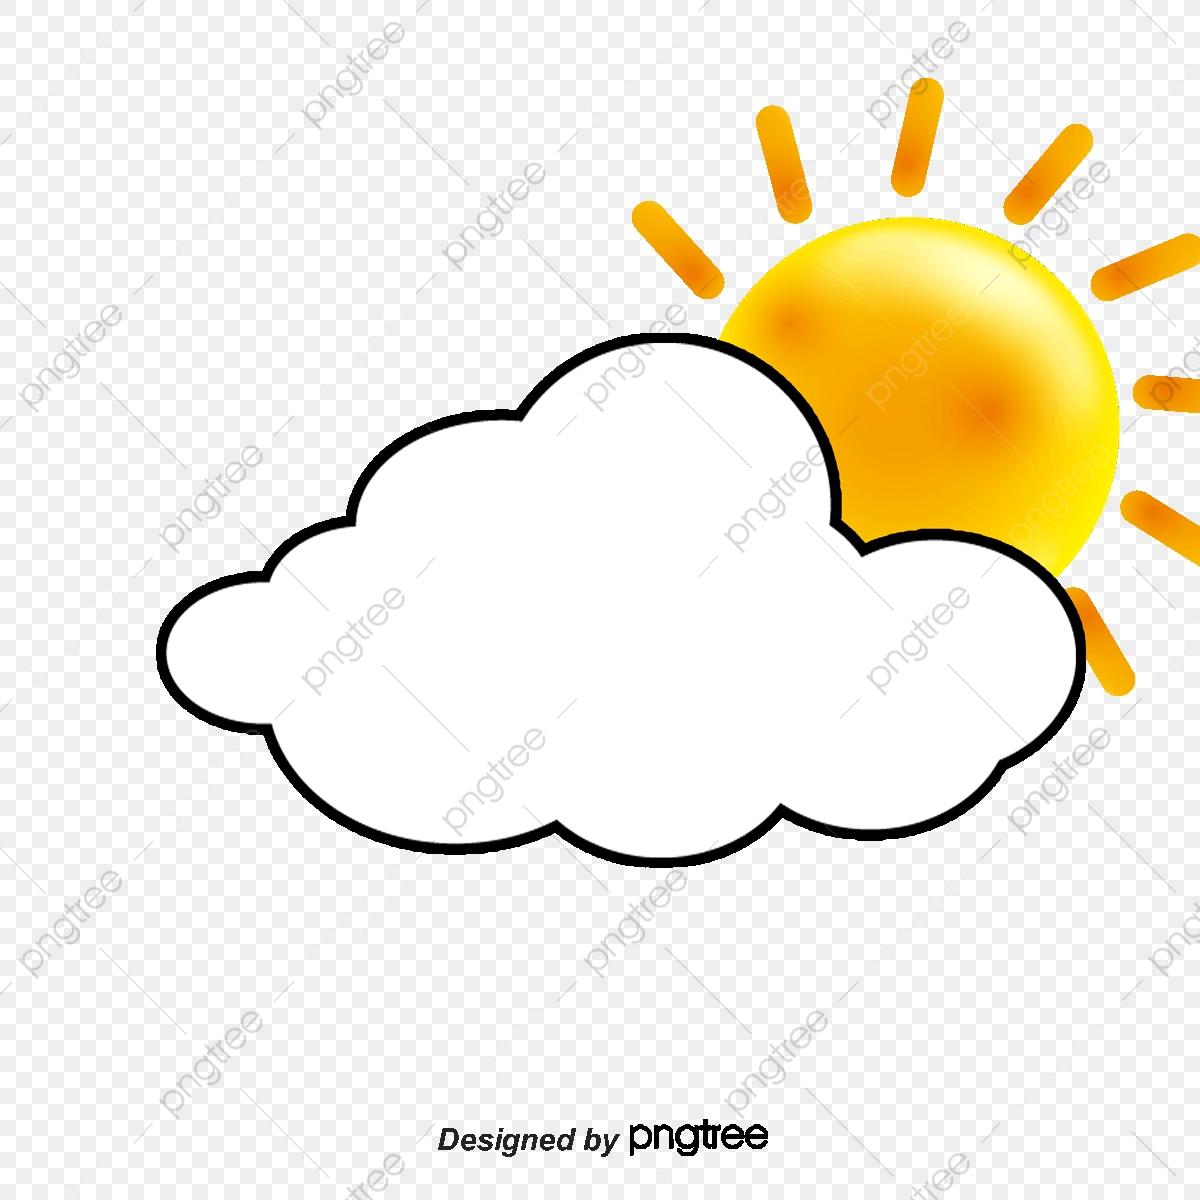 Clouds And Sun, Sun Clipart, Sun, Cloud PNG Transparent Clipart.